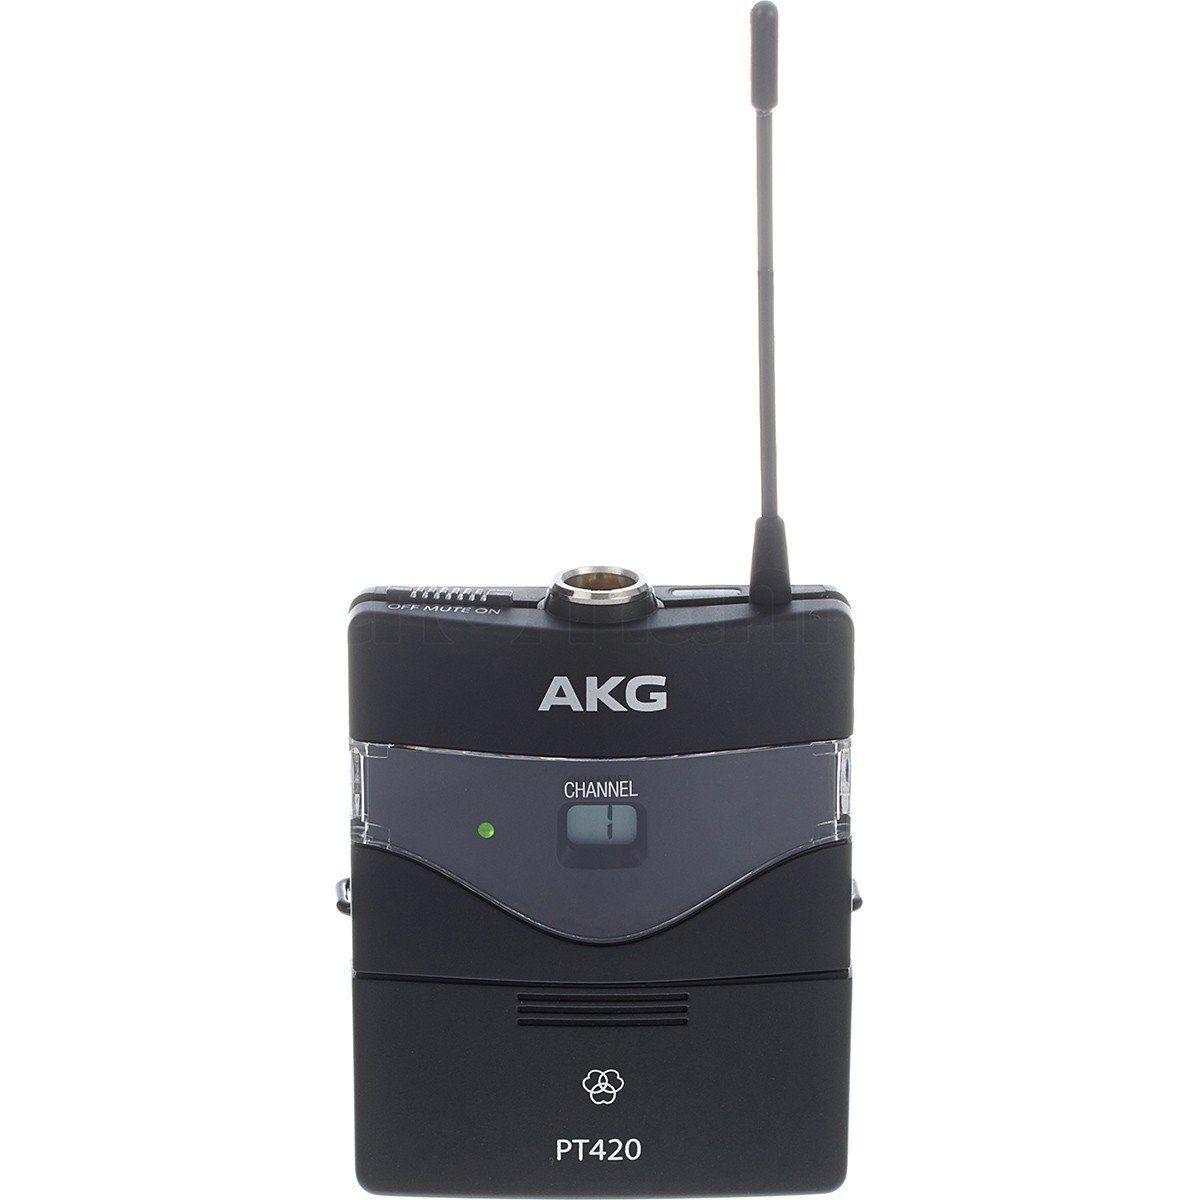 Akg WMS420 Single Headset Microfone Sem Fio Akg WMS 420 Single Headset